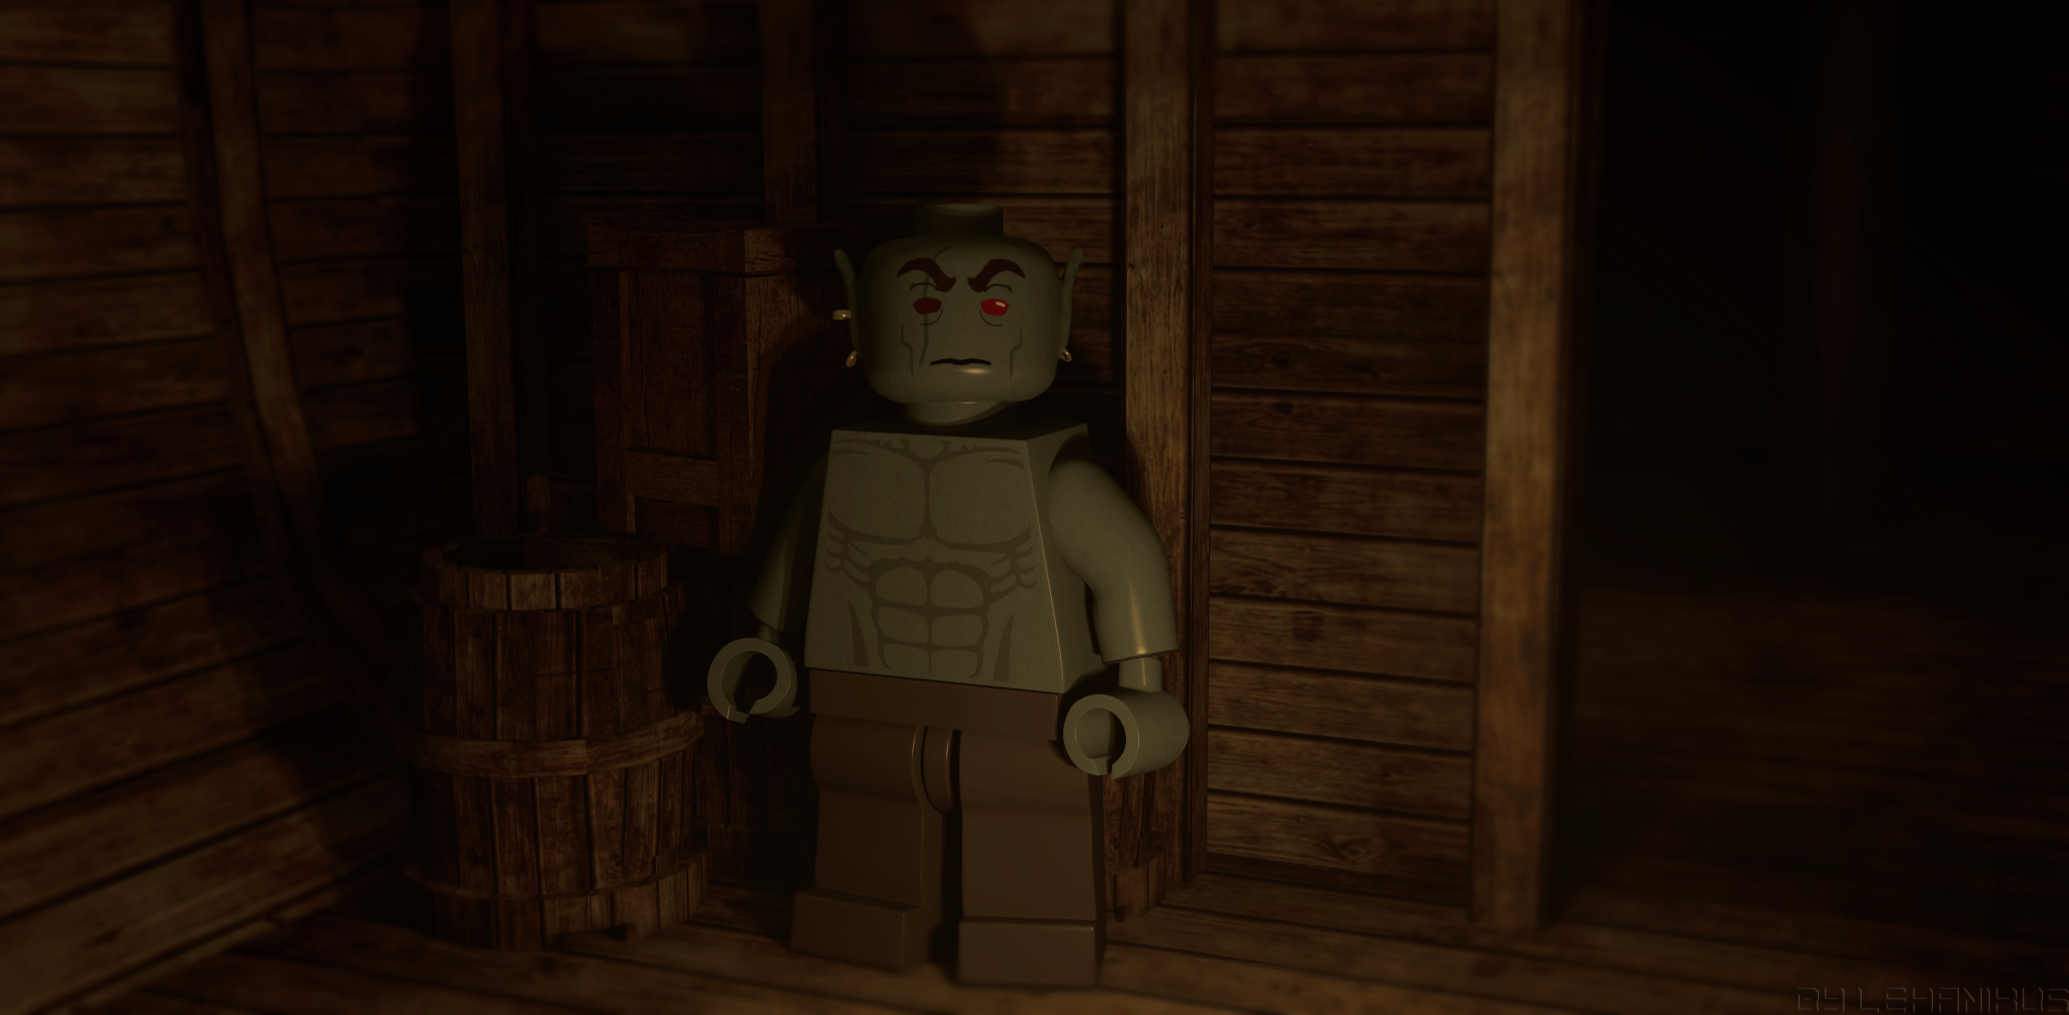 Lego Morrowind - Изображение 1